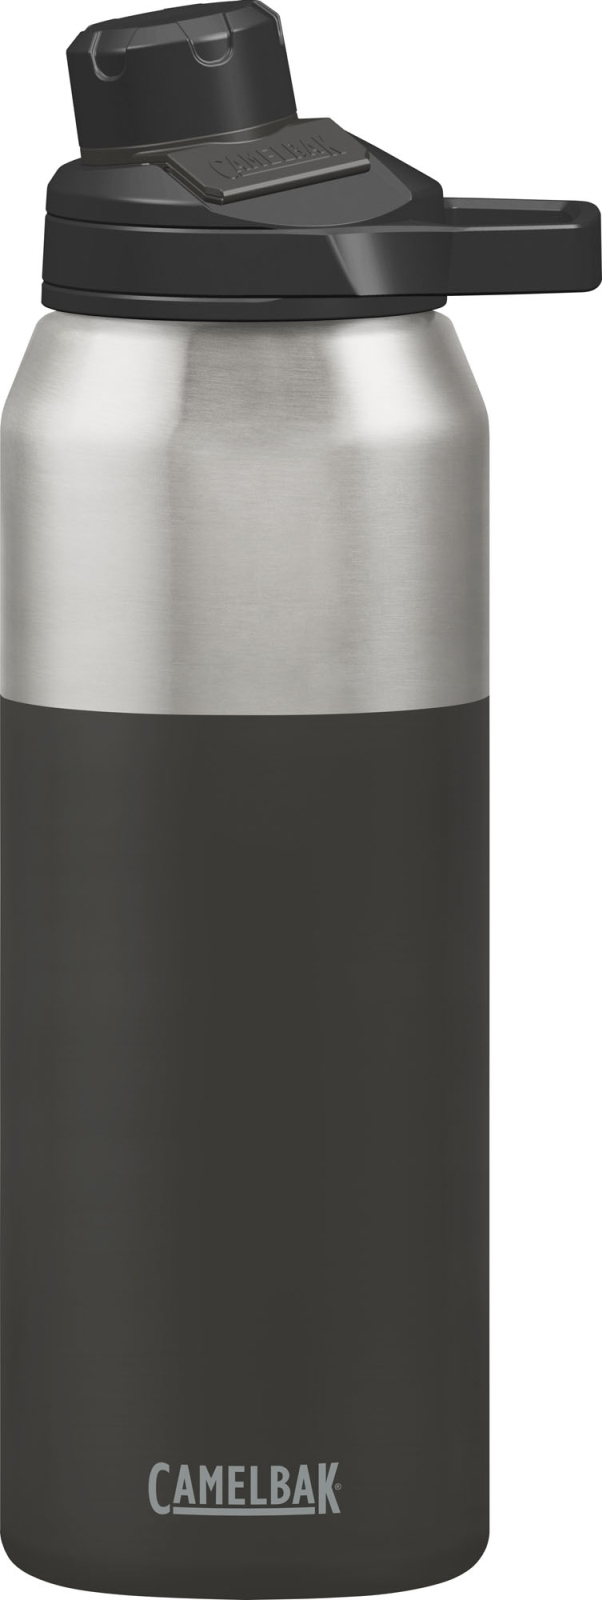 Camelbak Chute Mag Vacuum Stainless 1l - Jet uni